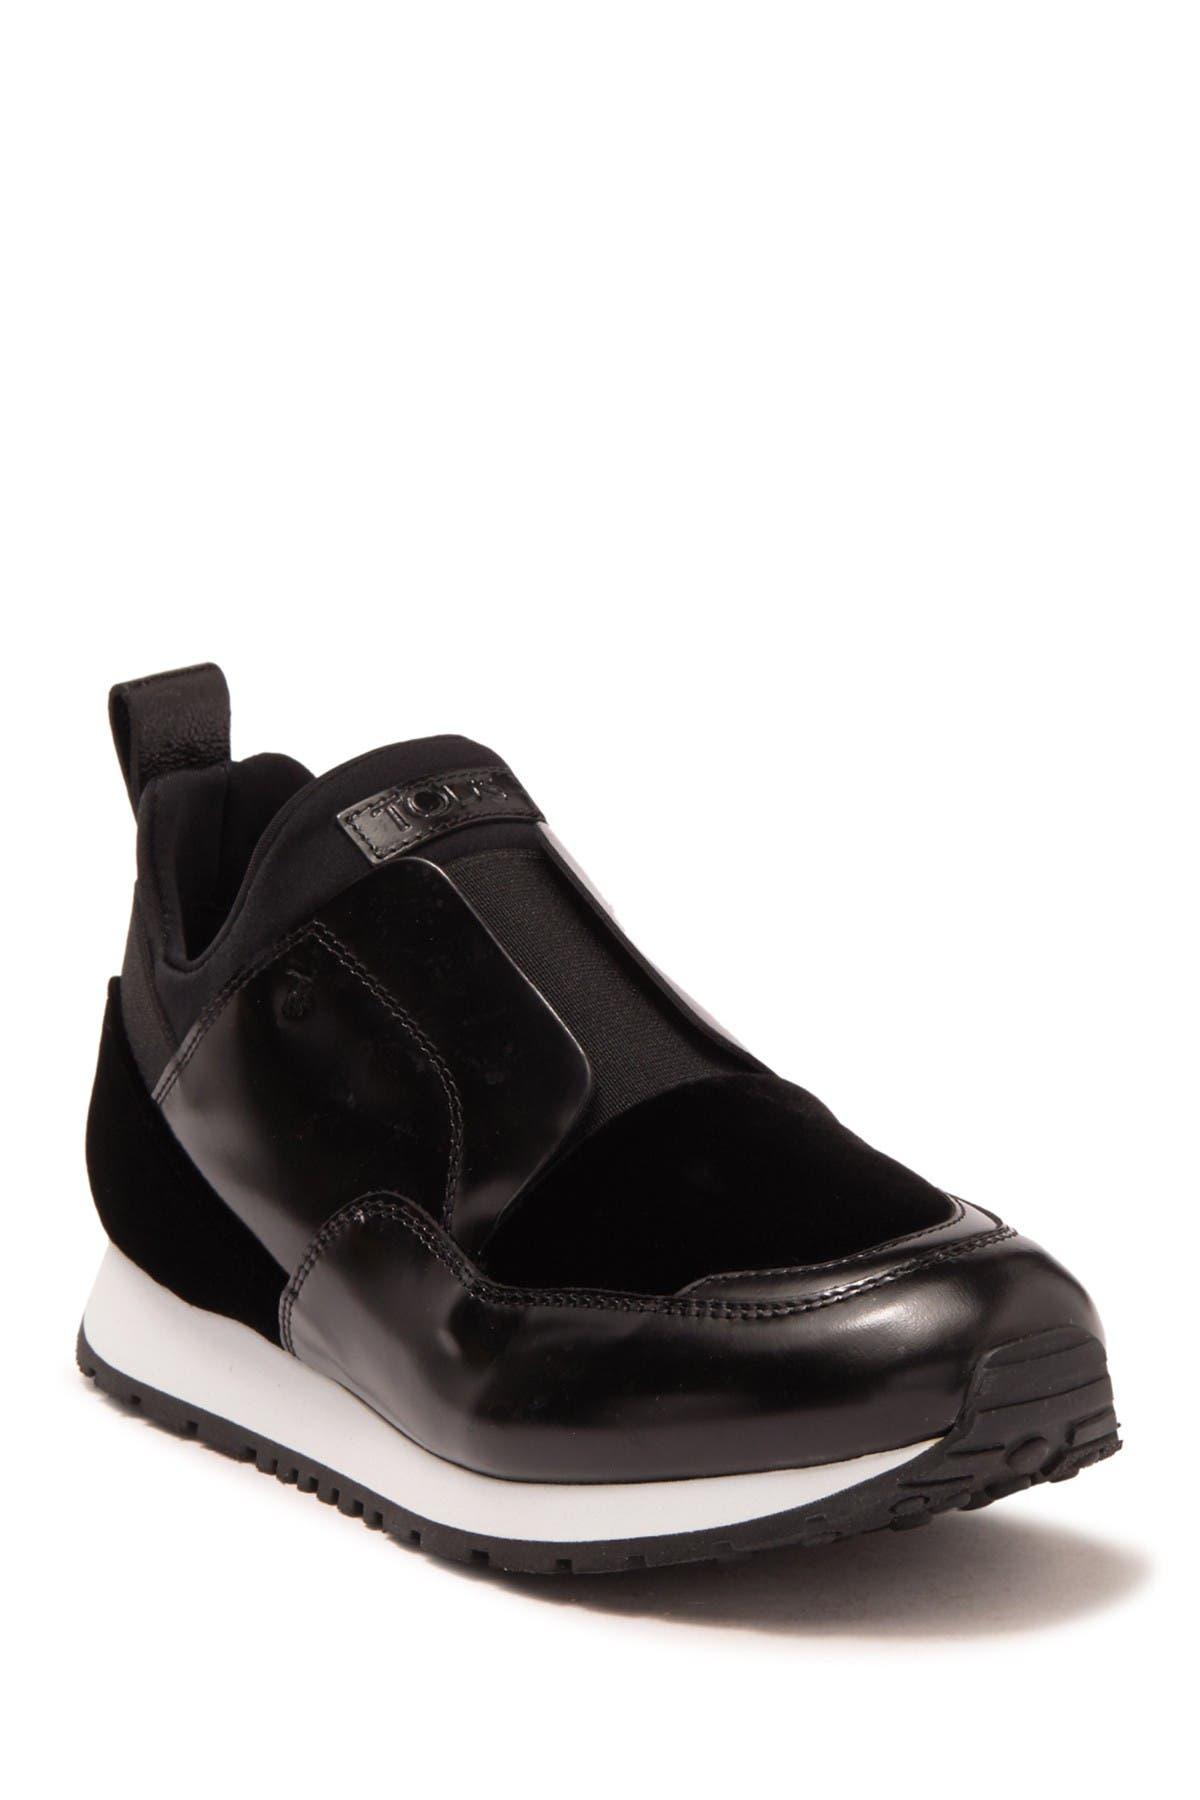 Image of Tod's Pantofola Slip-On Fashion Sneaker